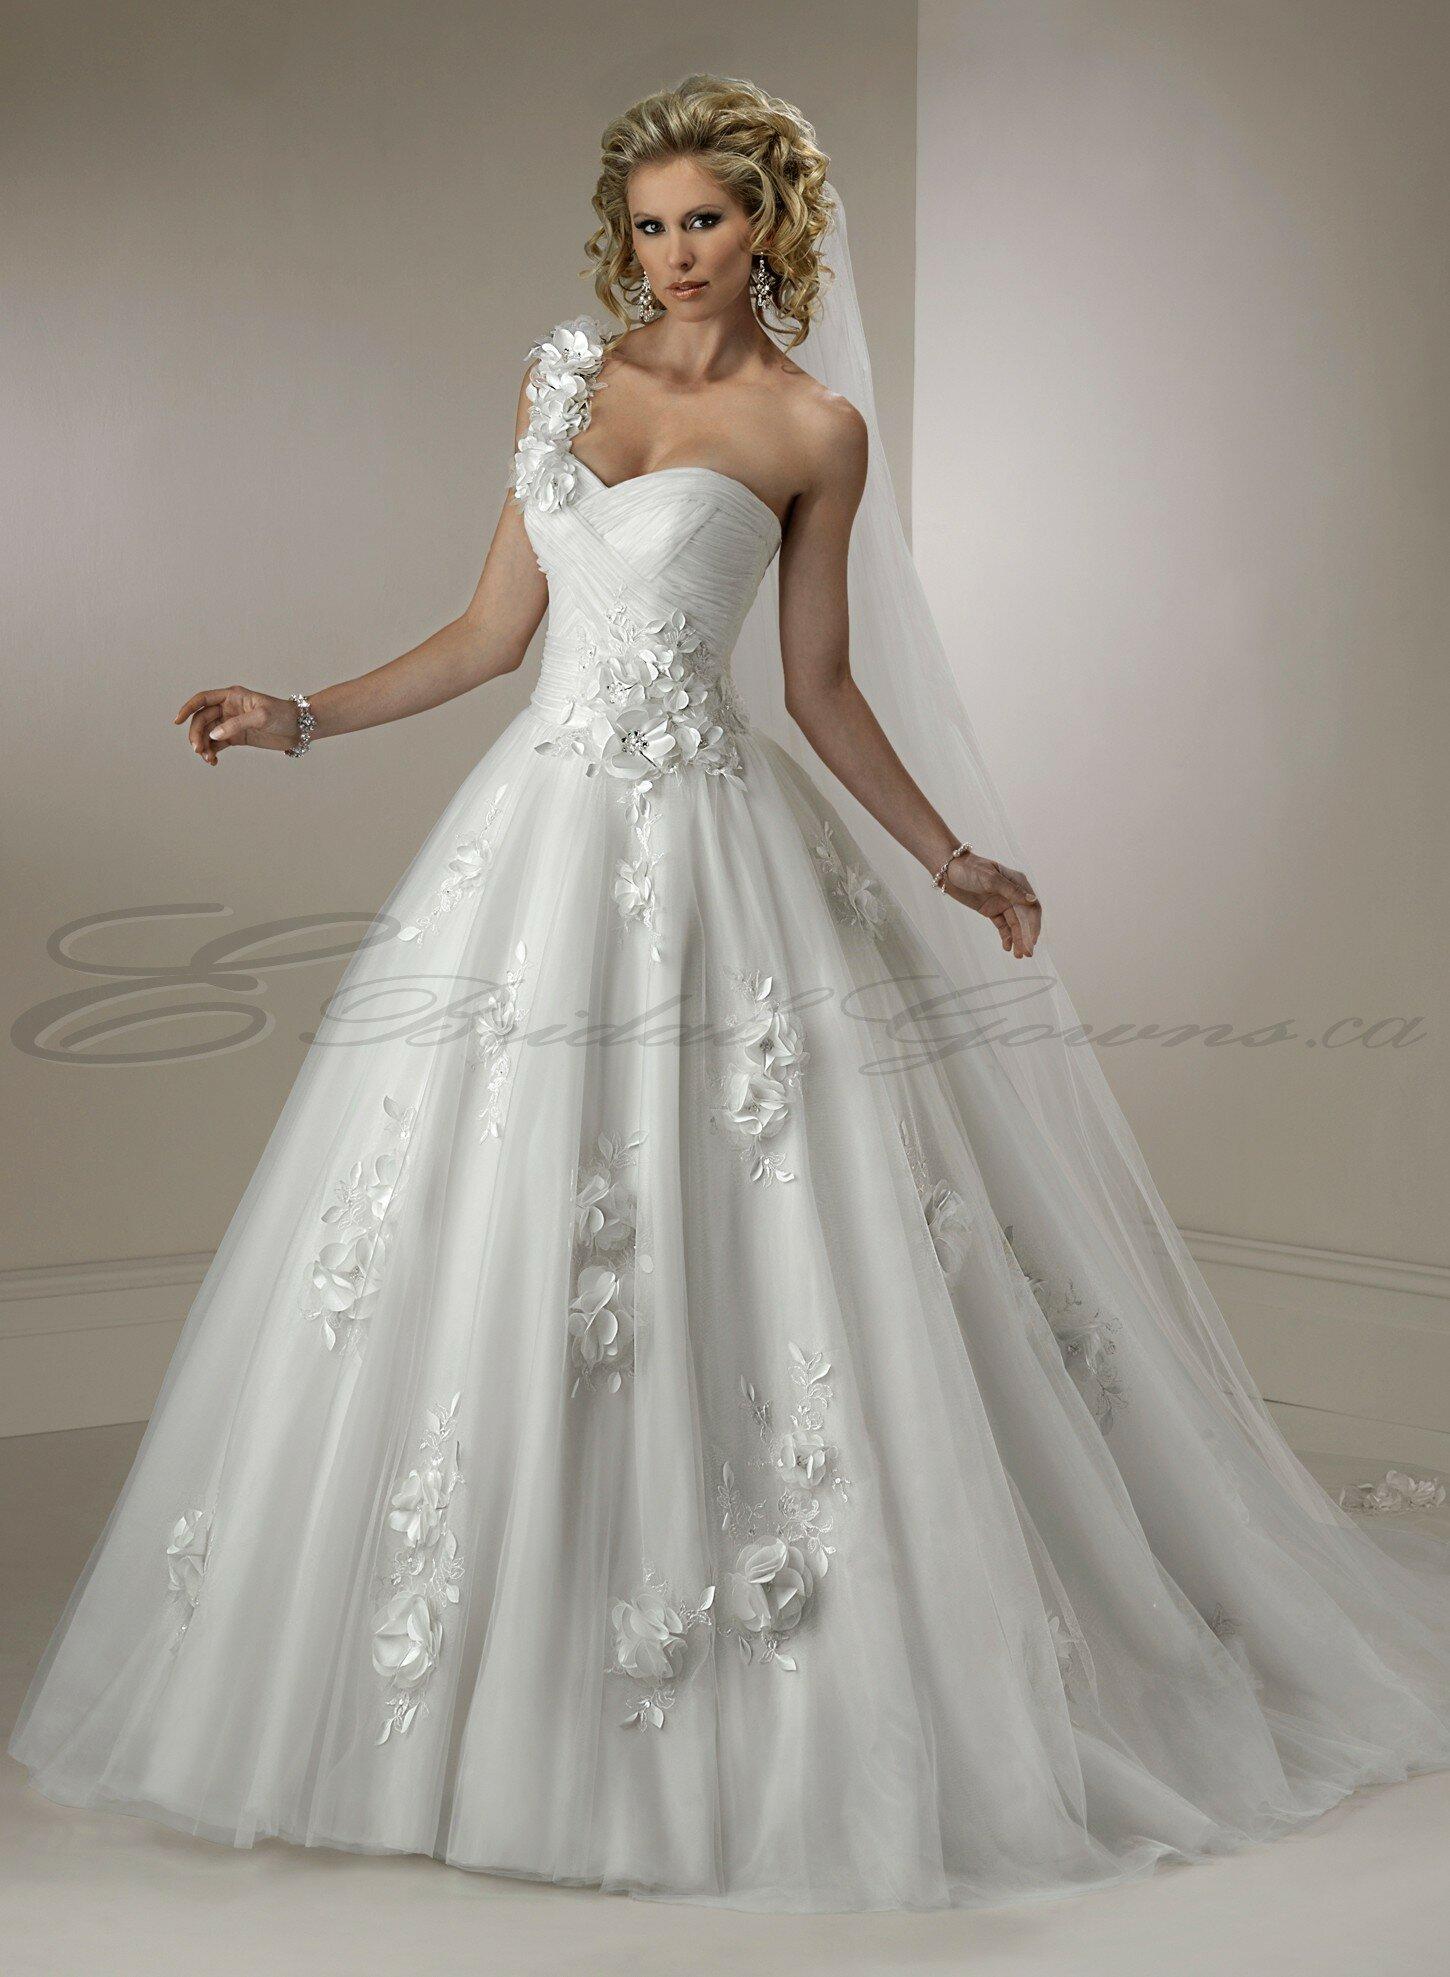 fun short wedding dresses wedding dresses las vegas Fun short wedding dresses